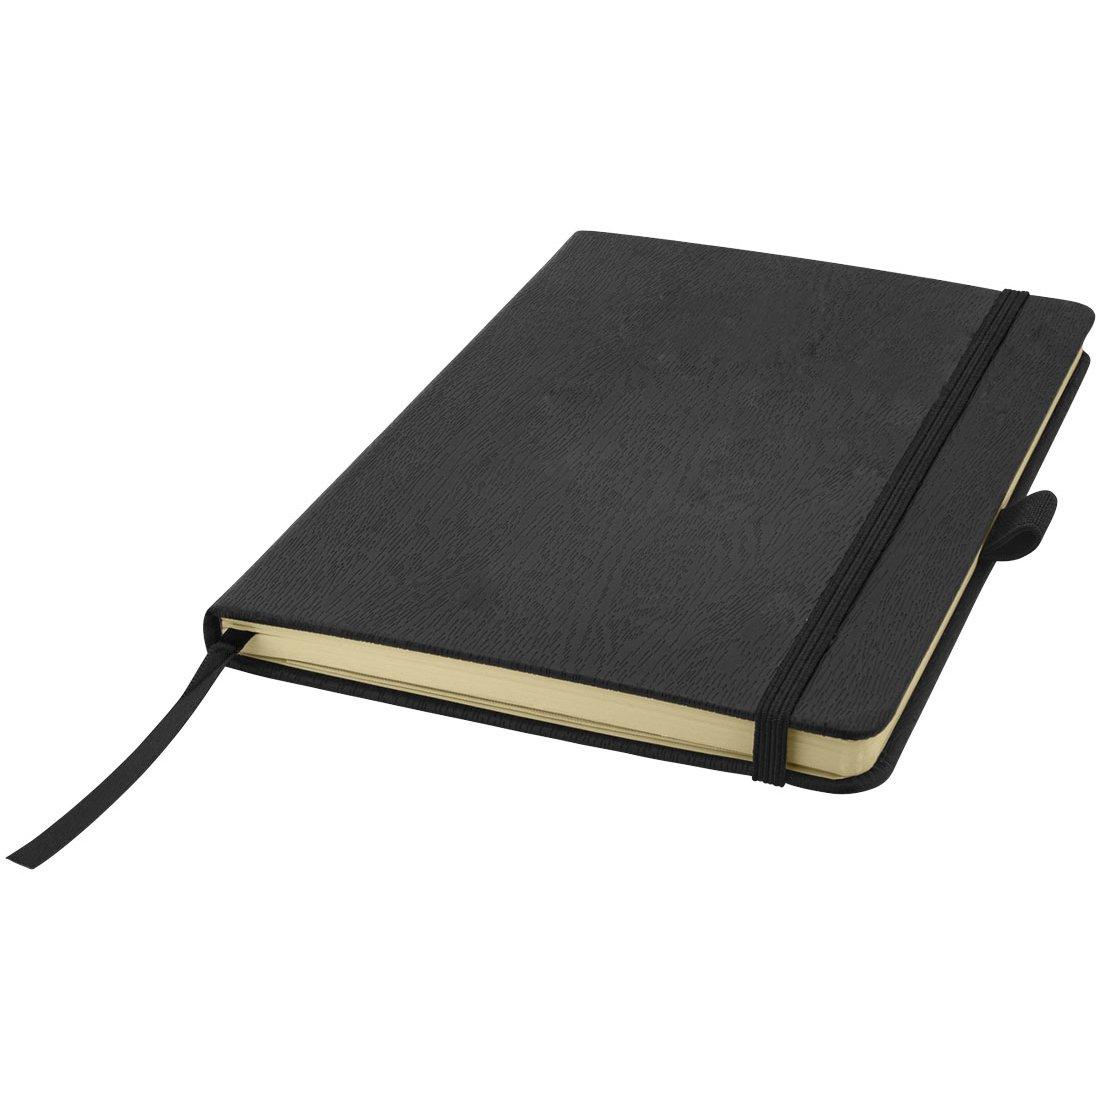 JournalBooks Woodlook notebook